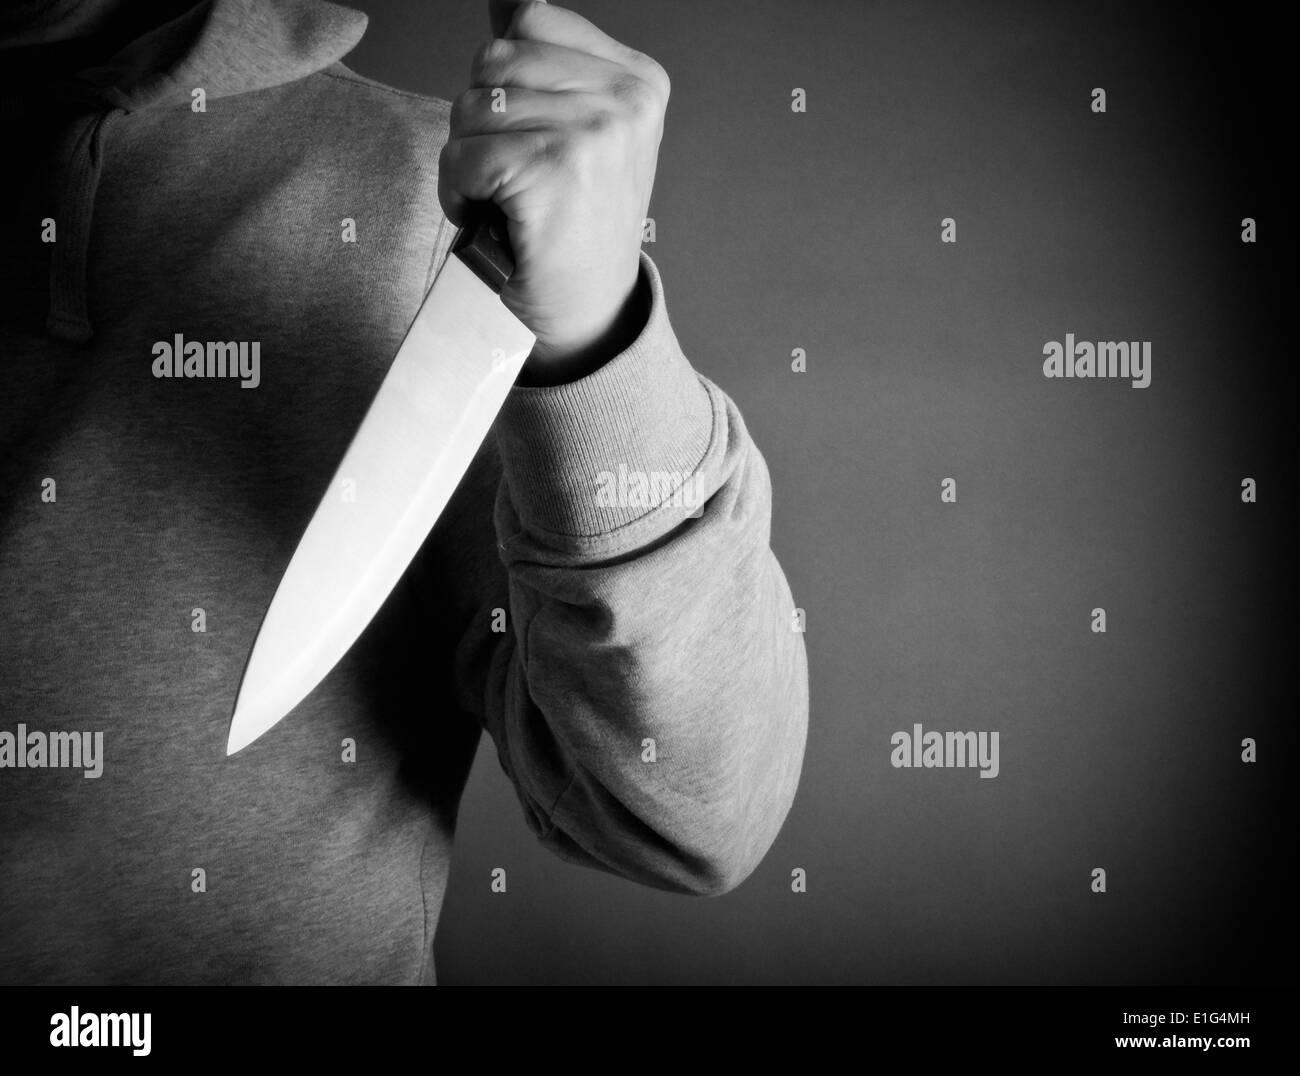 Knife crime - Stock Image